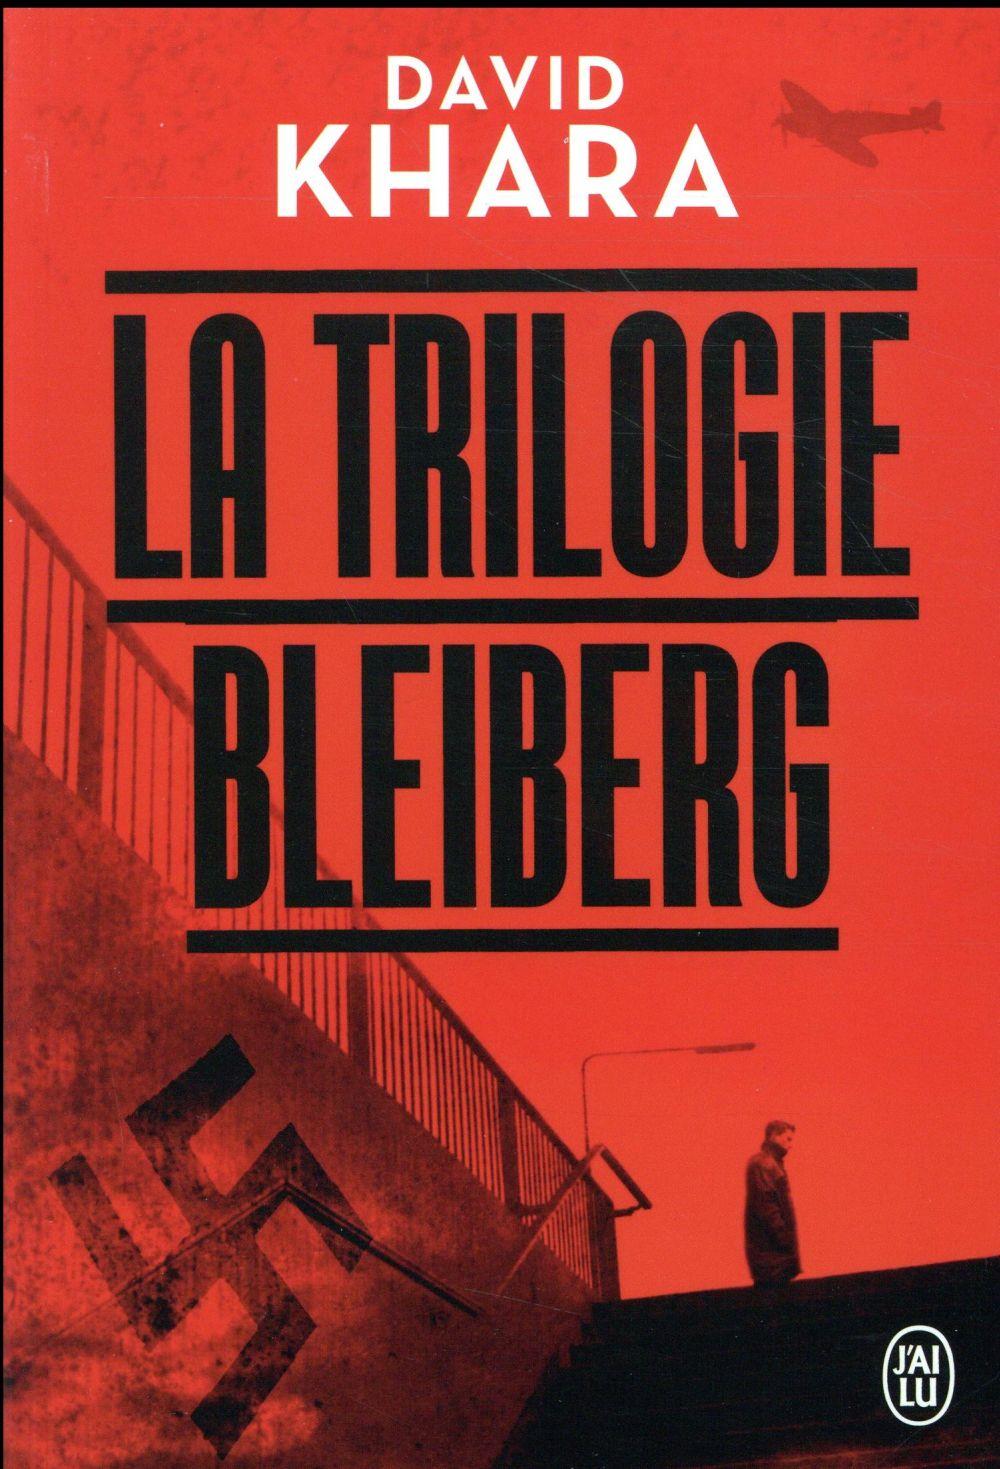 Khara David S. - LA TRILOGIE BLEIBERG